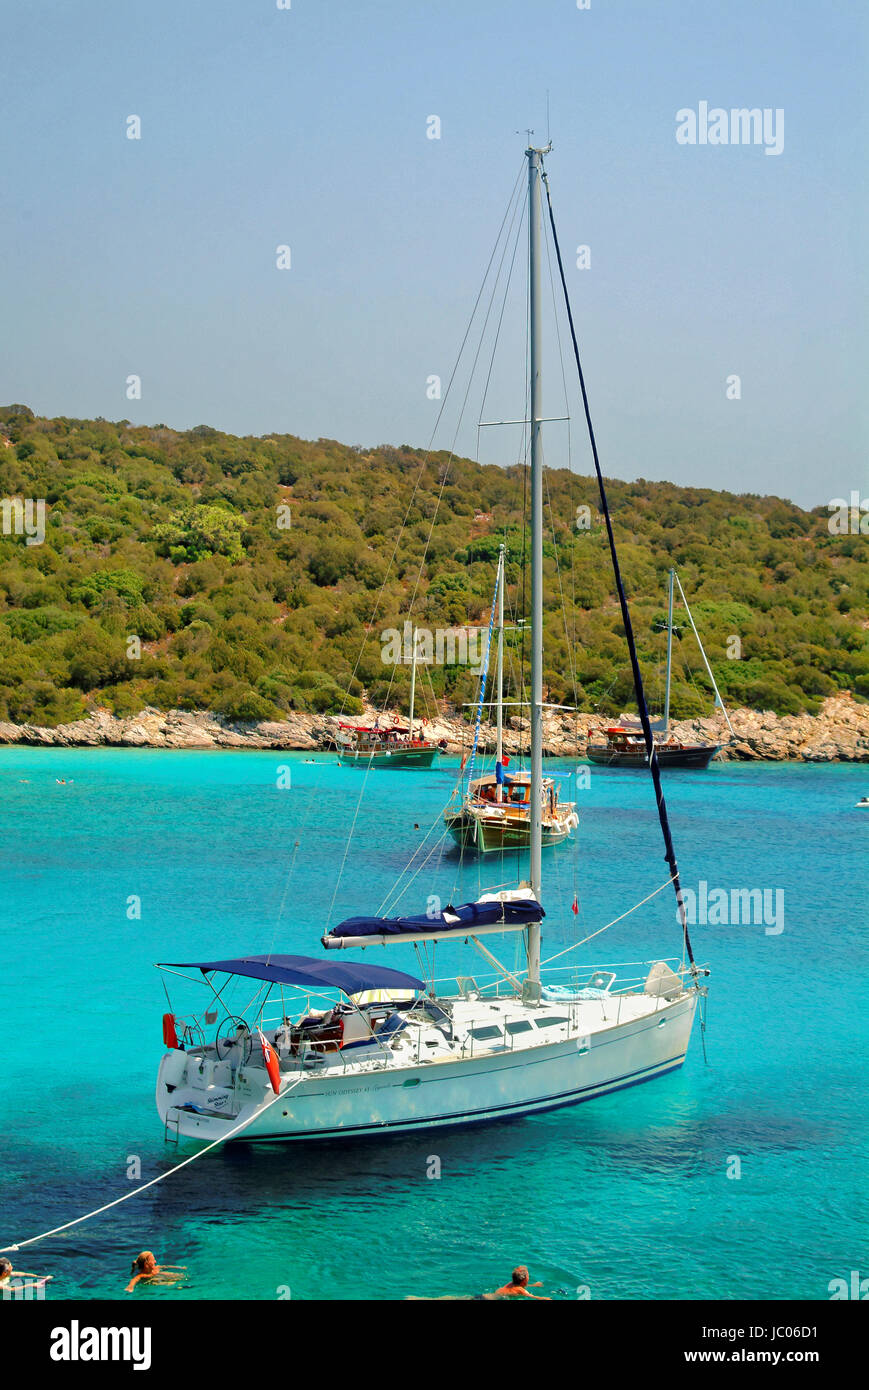 Cruising yacht at anchor in Poyraz bay, Karaada, near Bodrum Turkey. - Stock Image